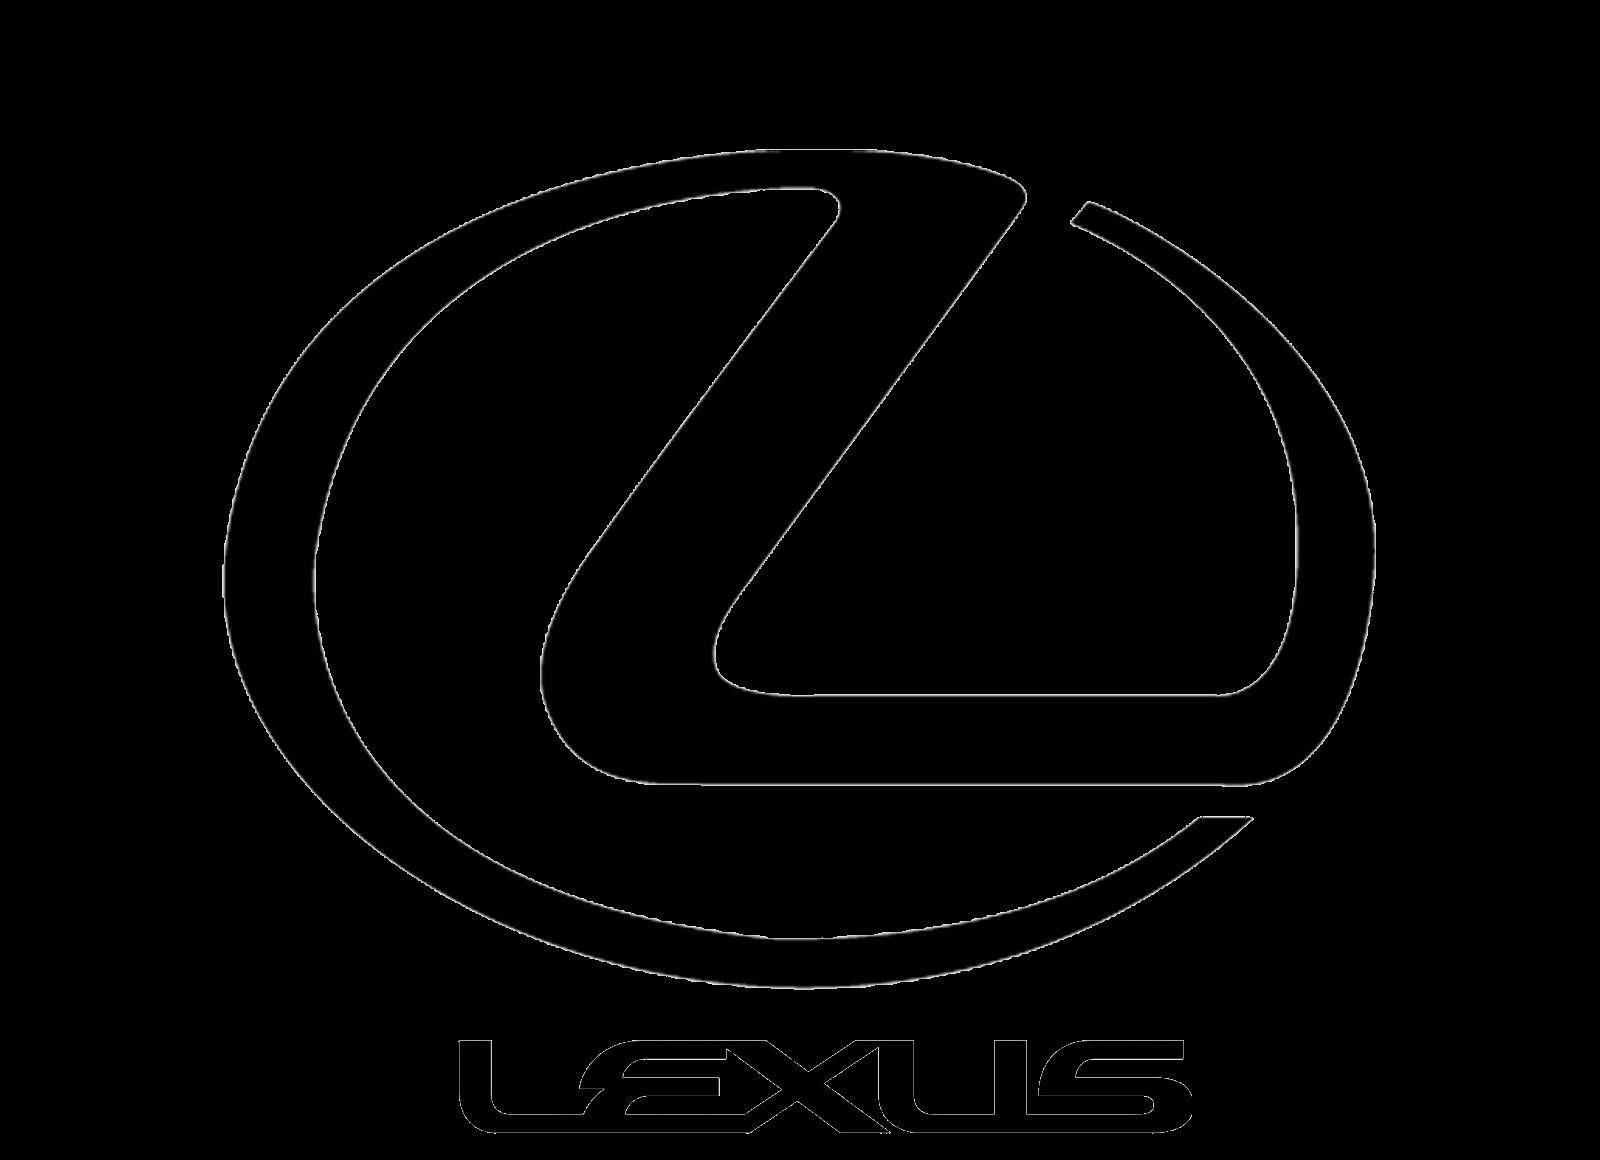 Lexus Logos Png Image Purepng Free Transparent Cc0 Png Image Library